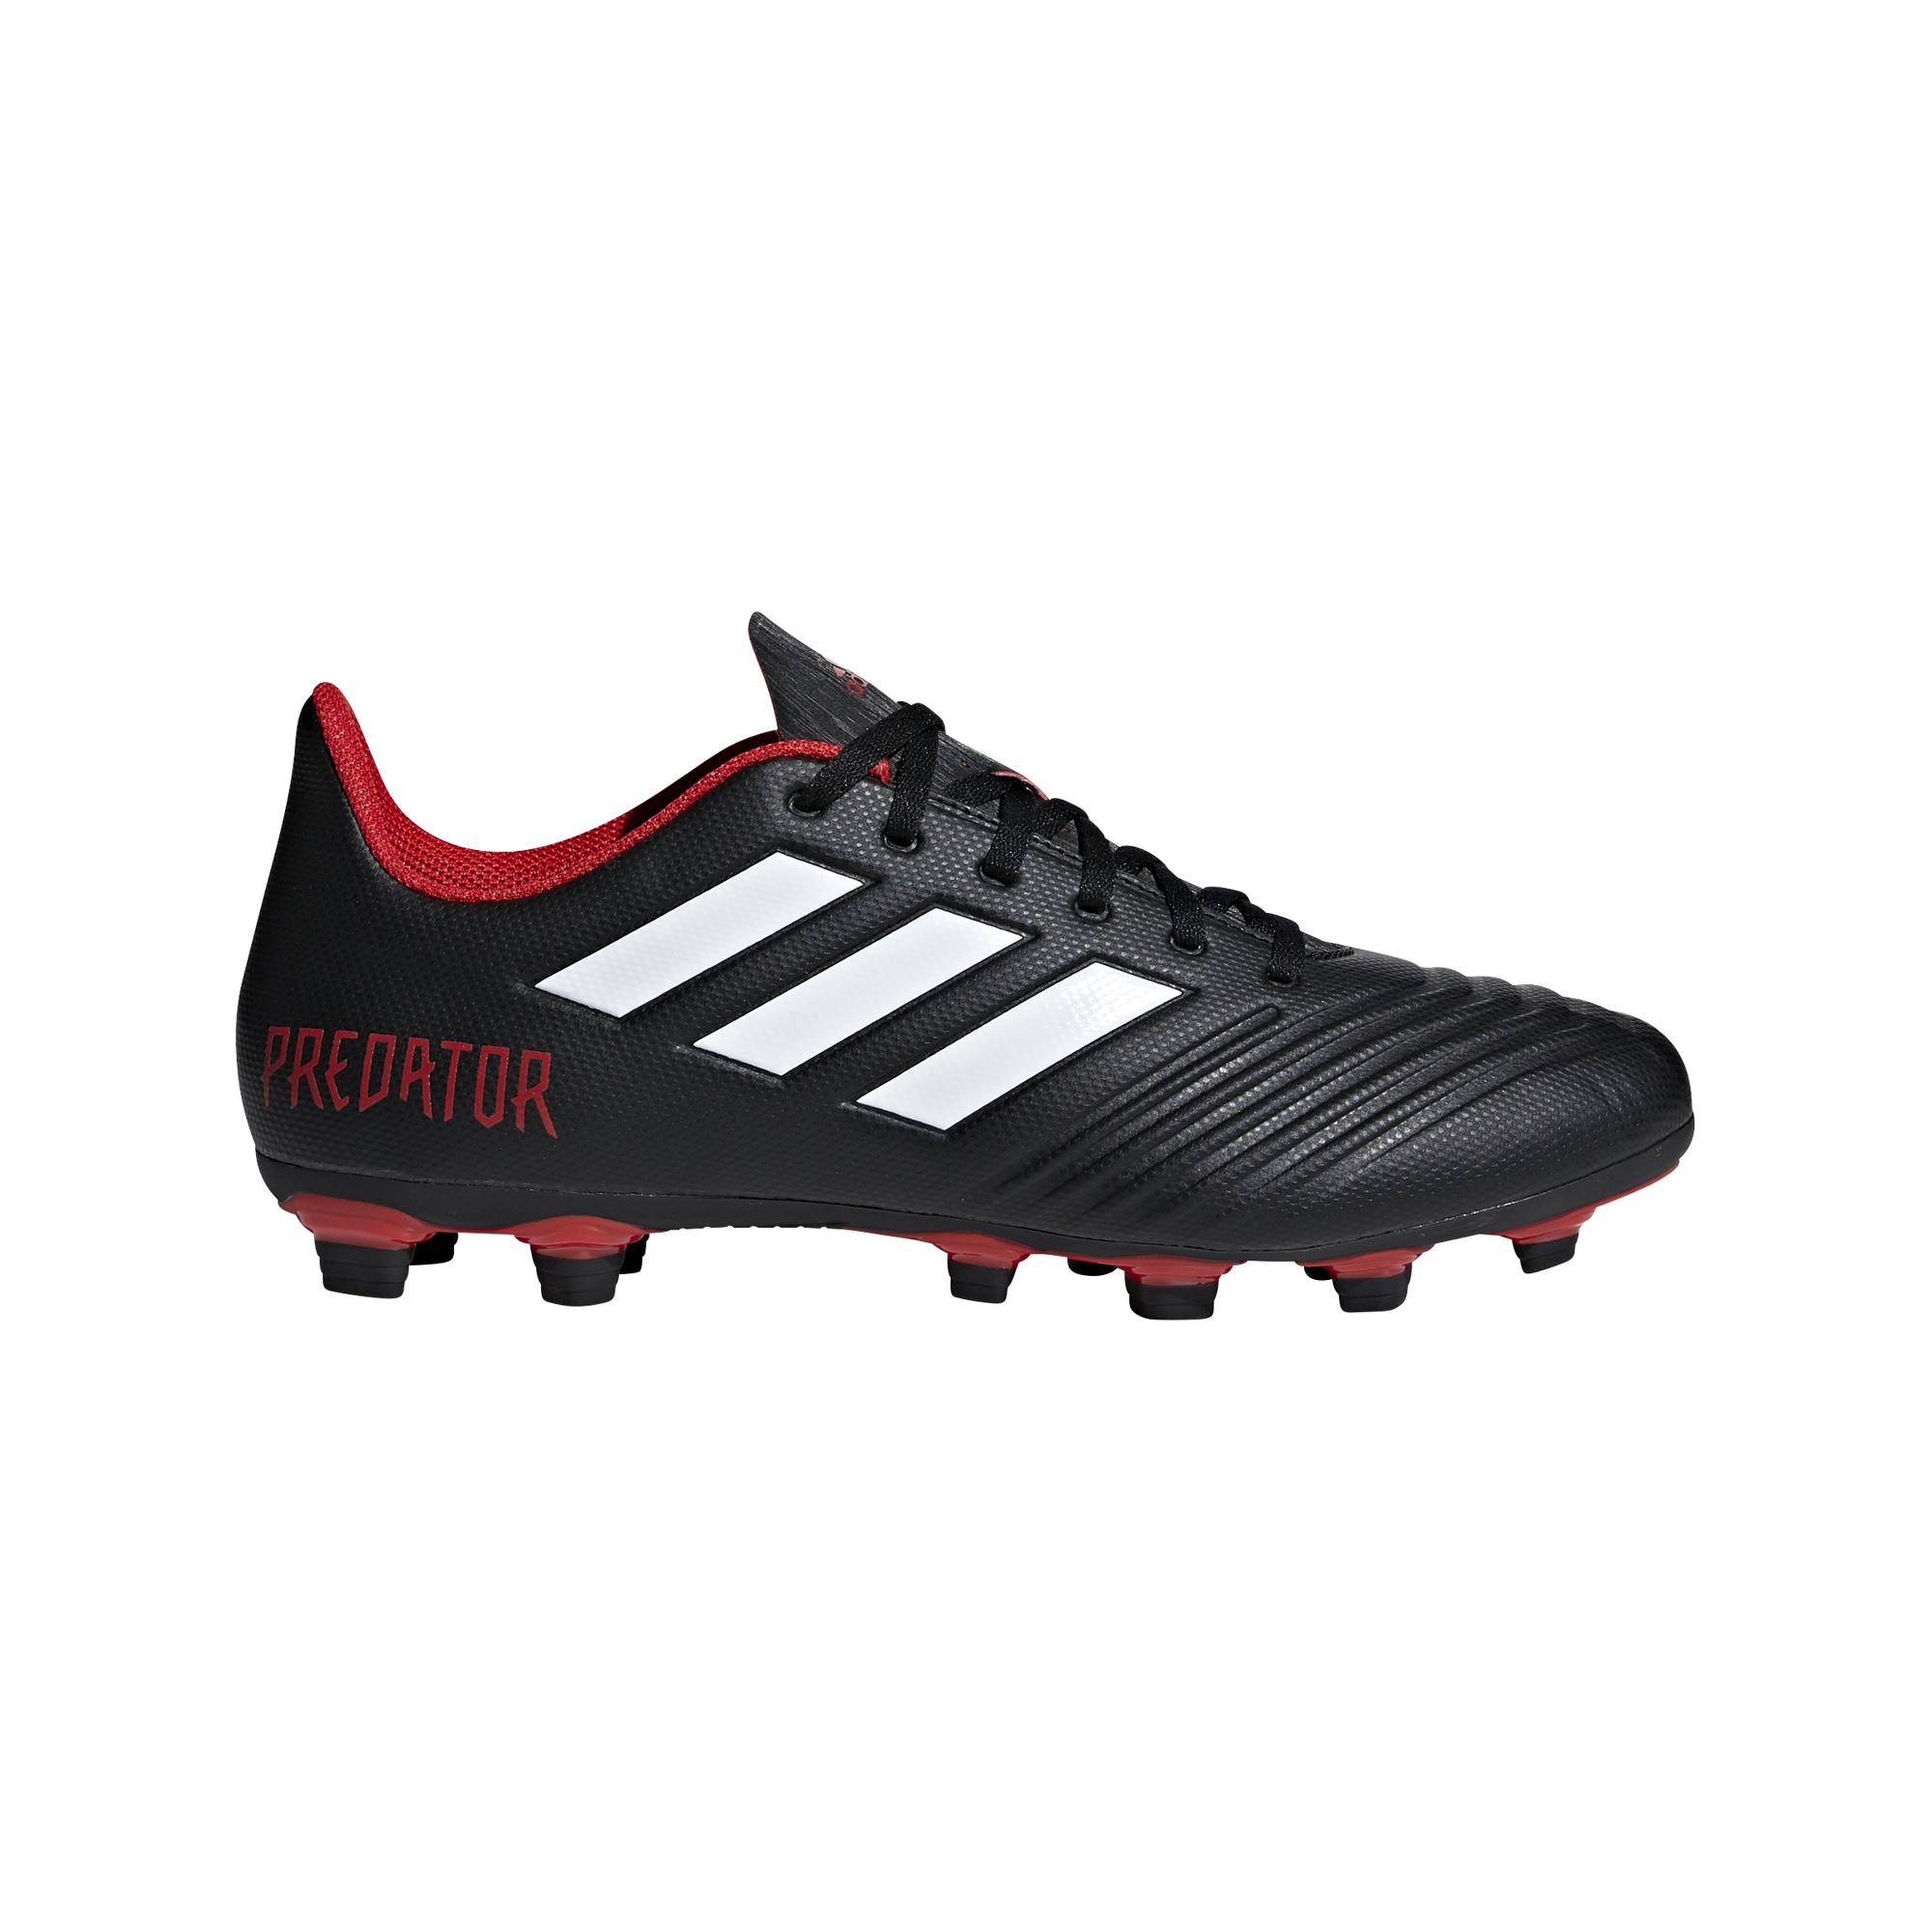 new arrivals adidas fußballschuhe predator 03be6 d13e8